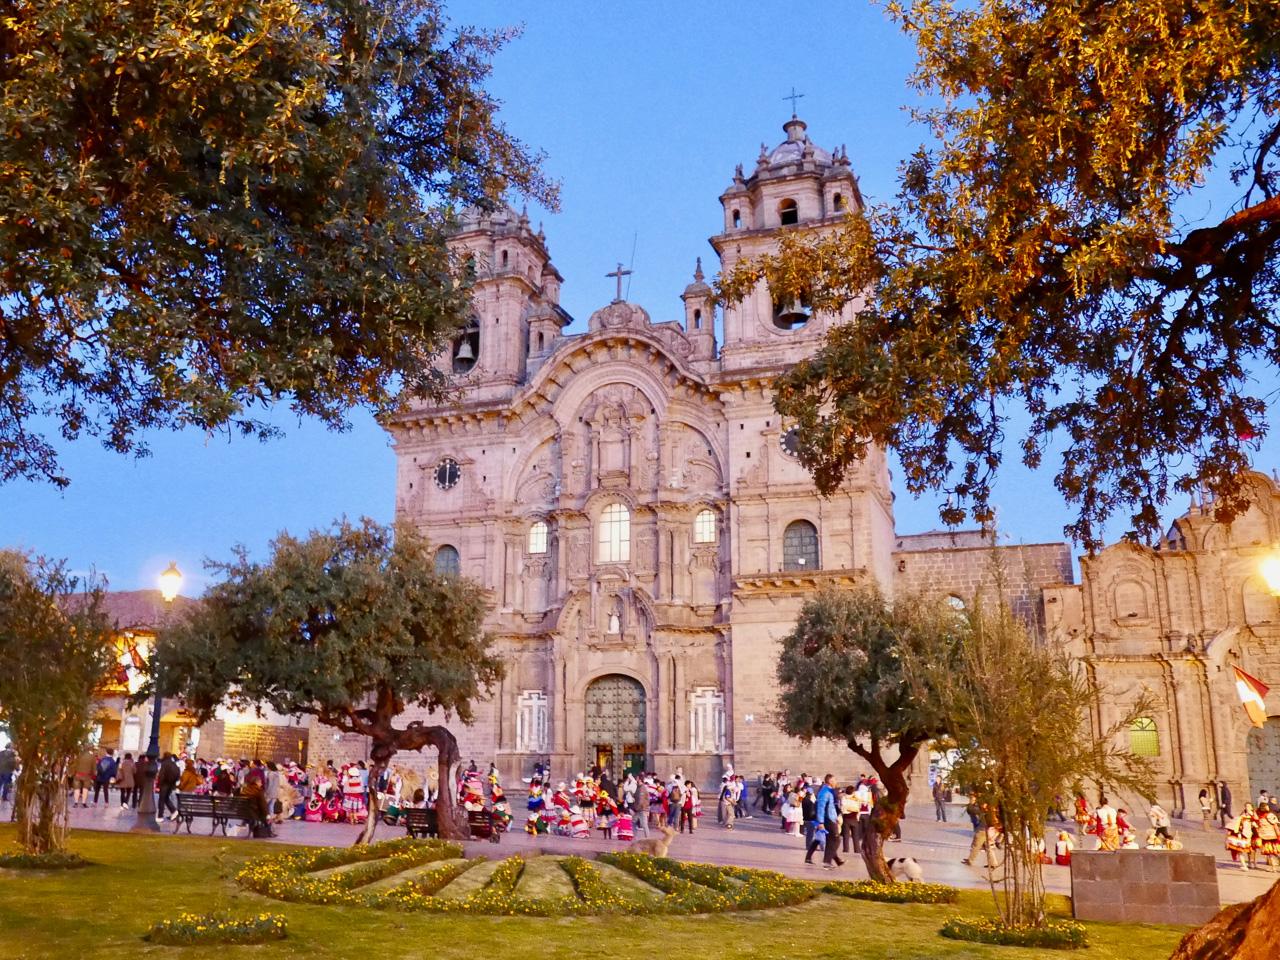 Cara Sharratt Travel - Templo de la Compañía de Jesús - Cusco, Peru